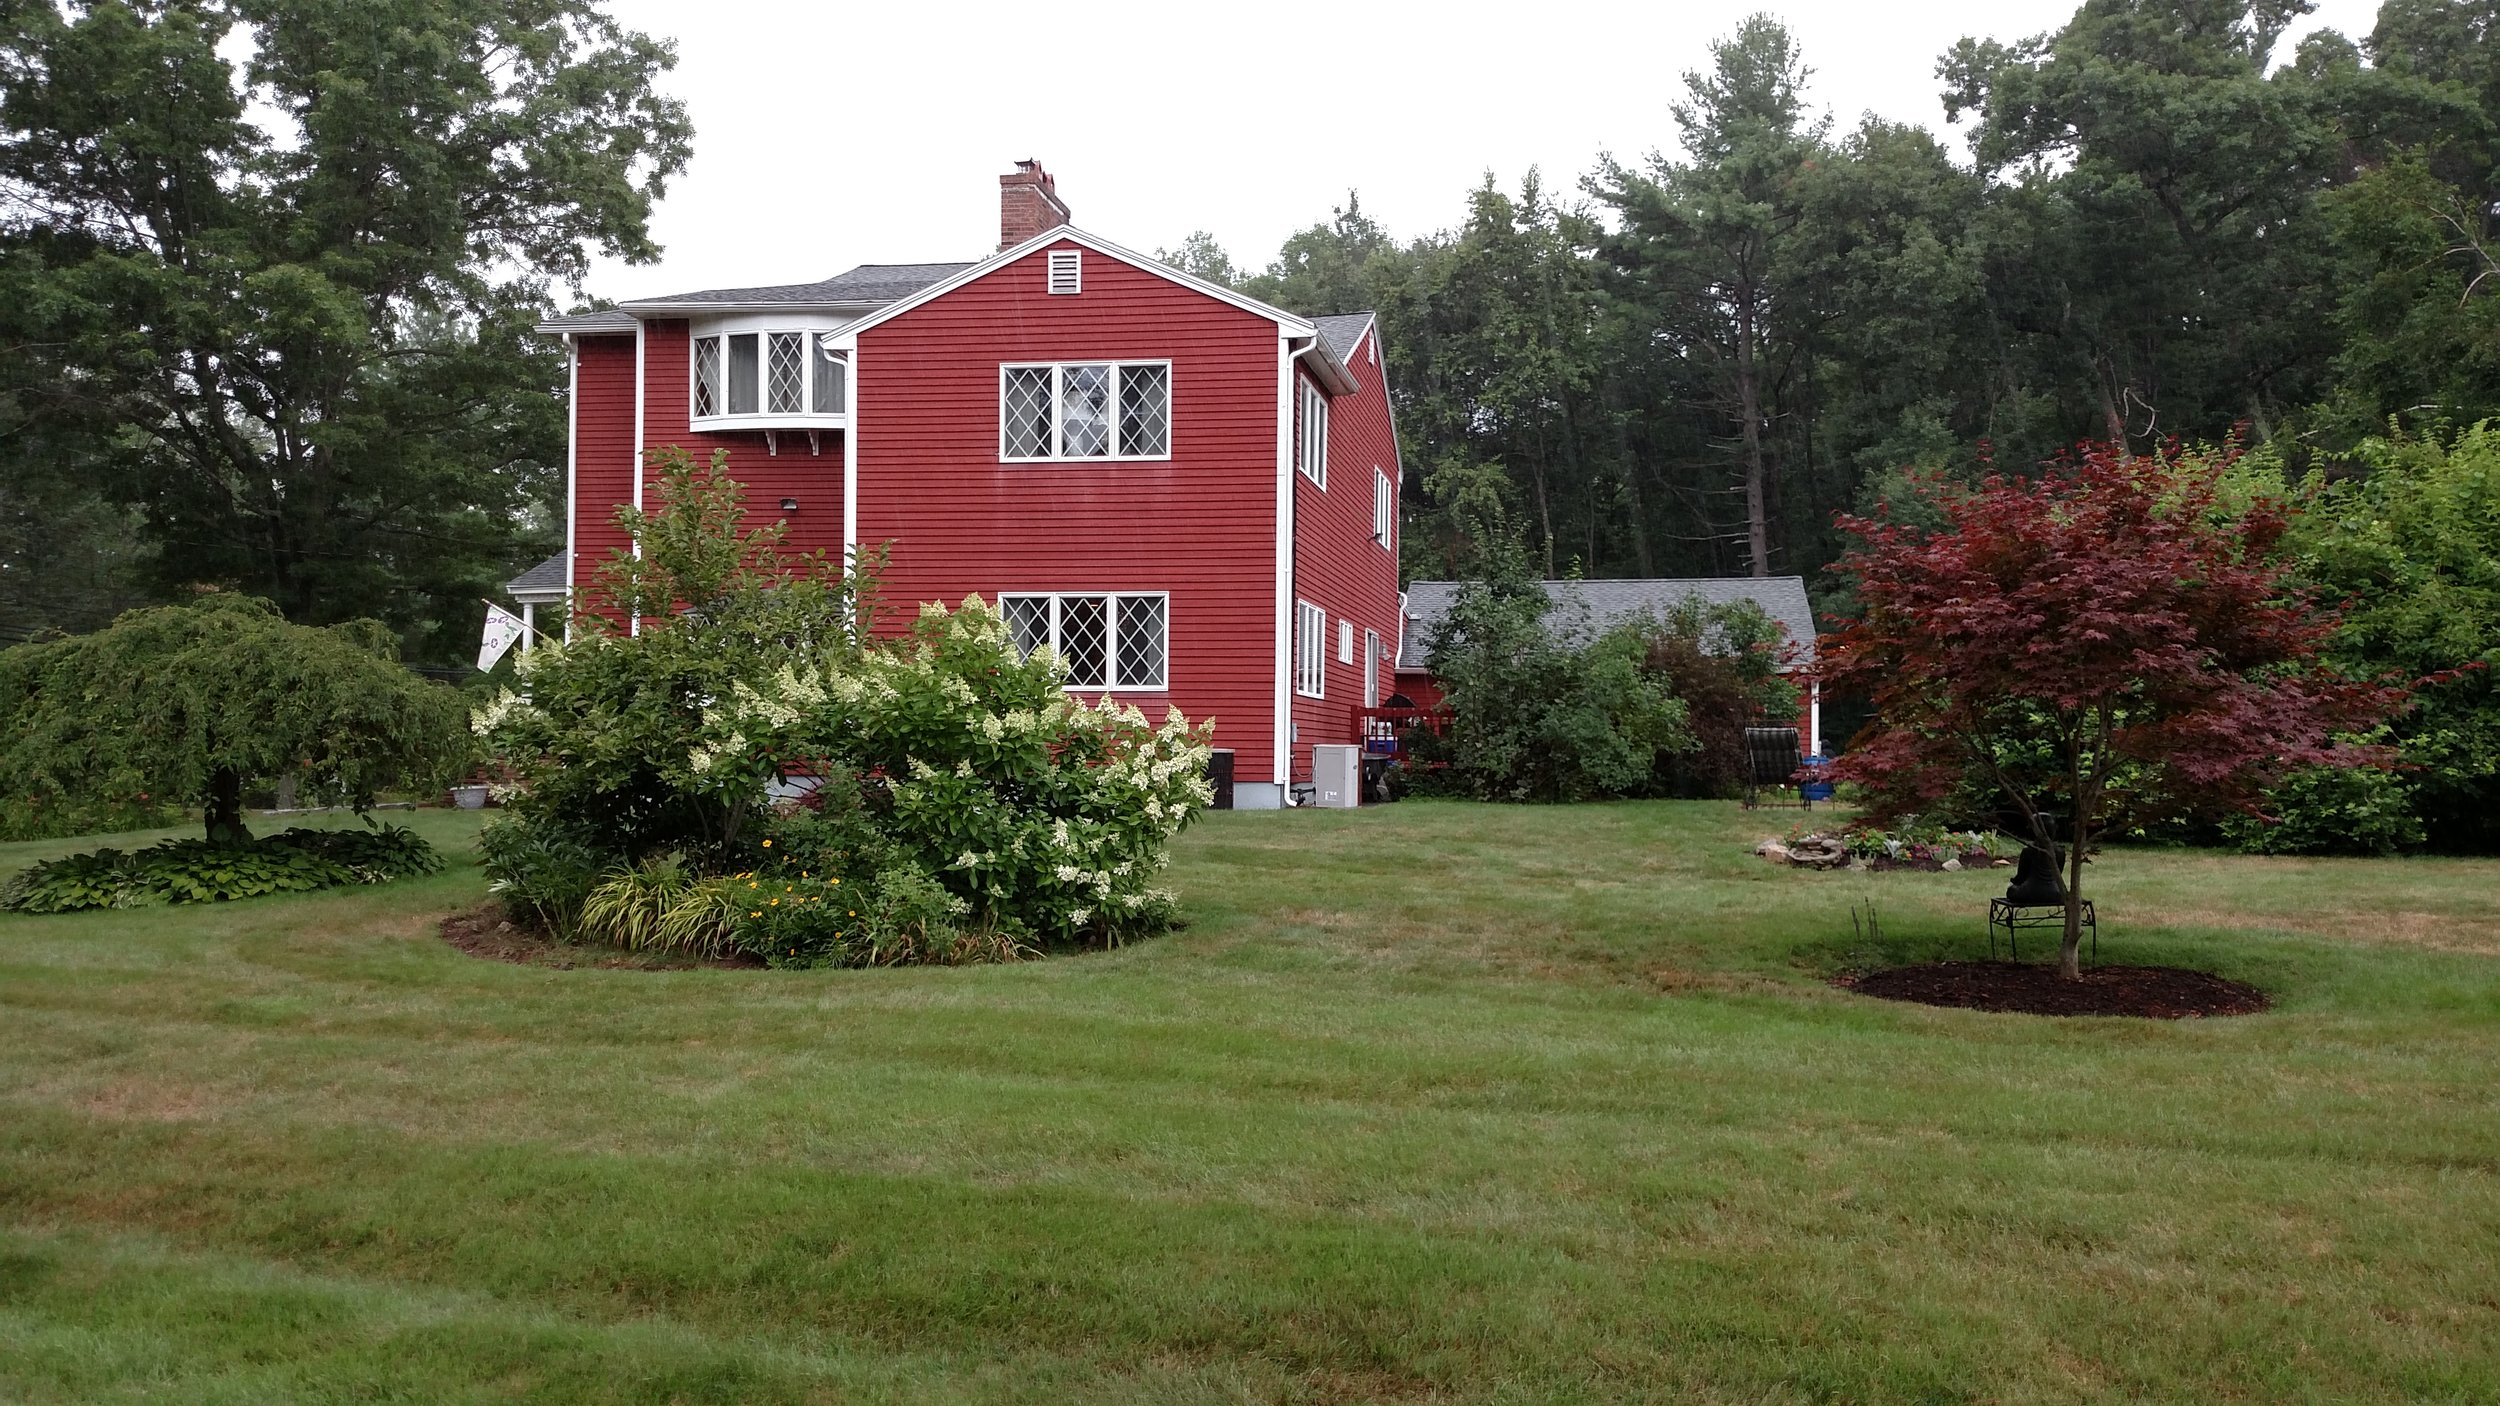 7-20-18 Shapiro Garden .jpg